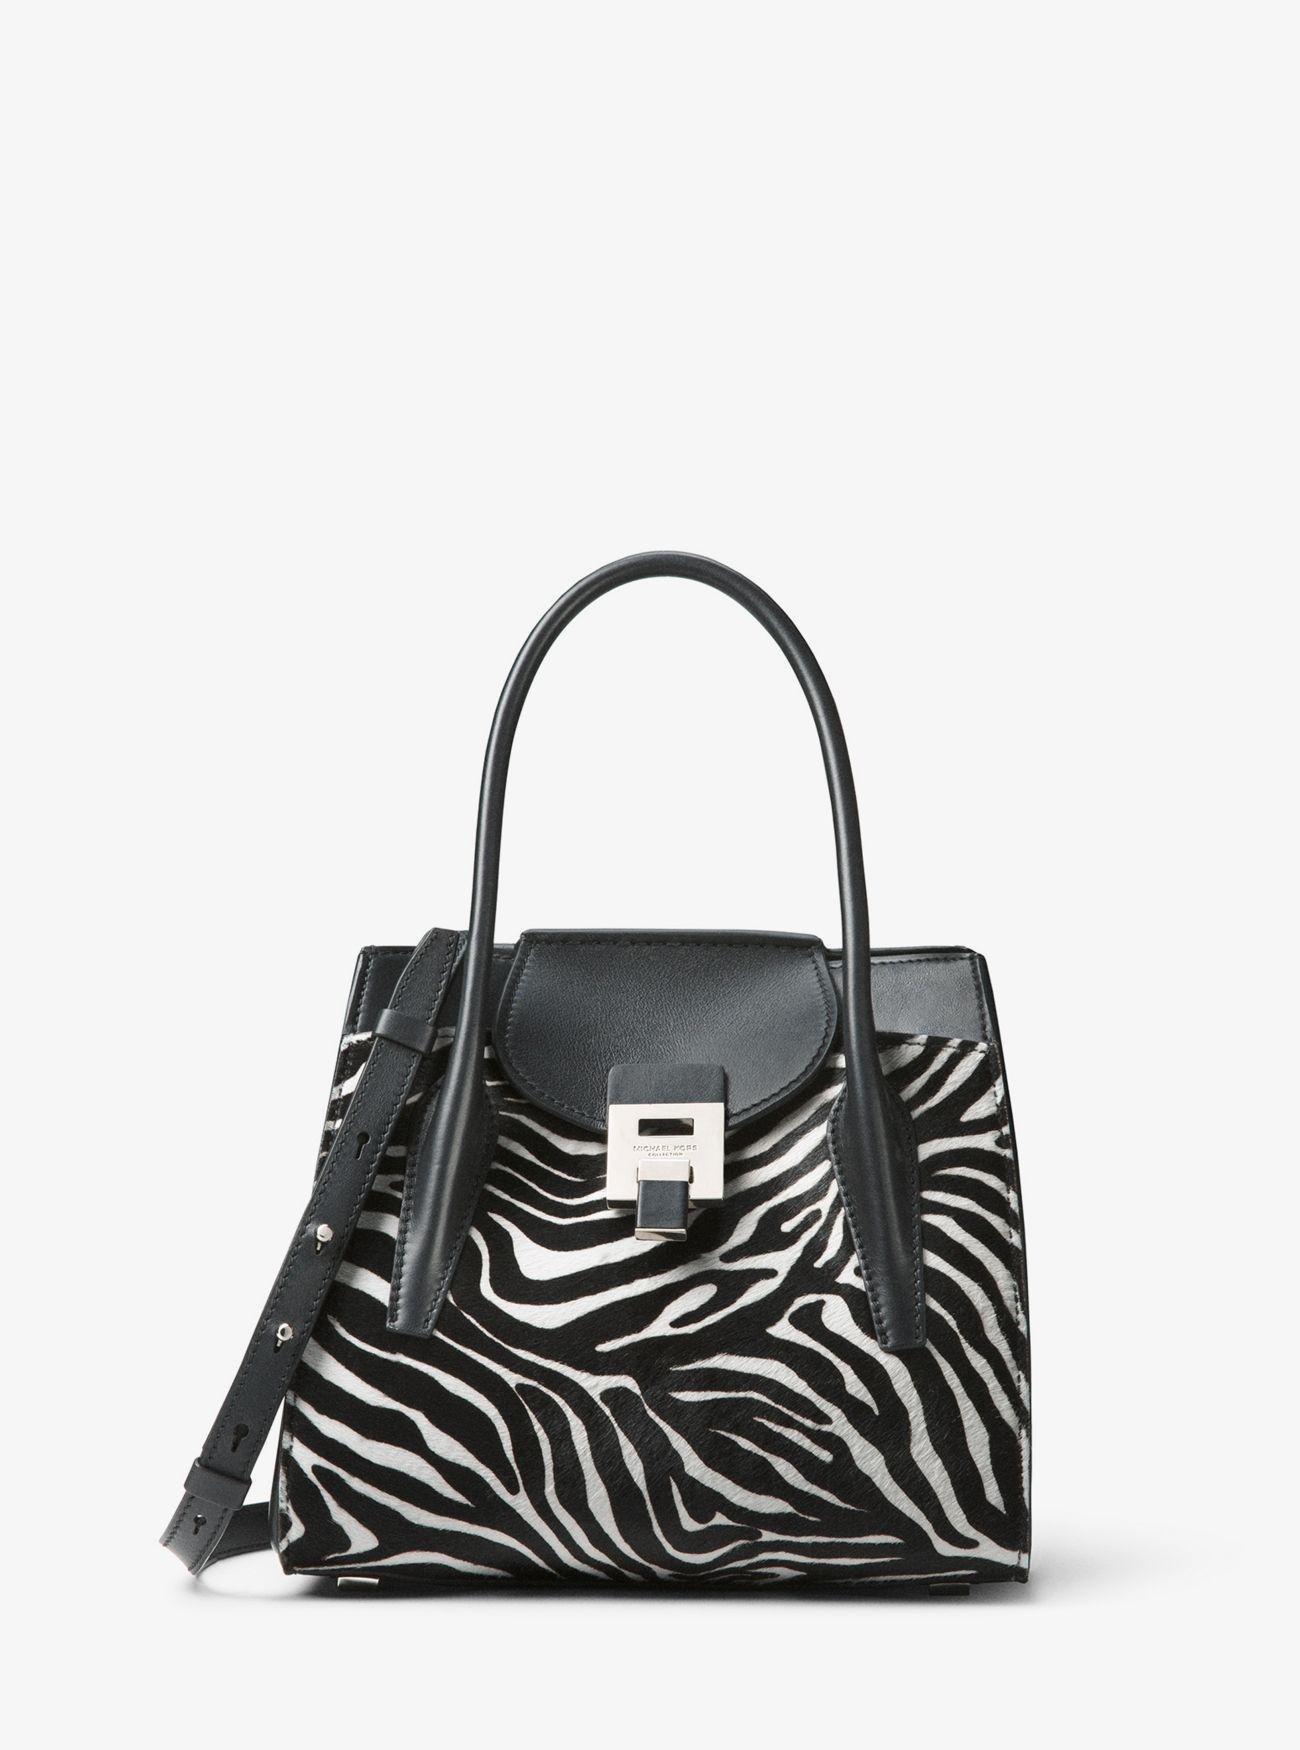 9985edcc3902 Michael Kors Bancroft Medium Zebra Calf Hair Satchel in Black - Lyst